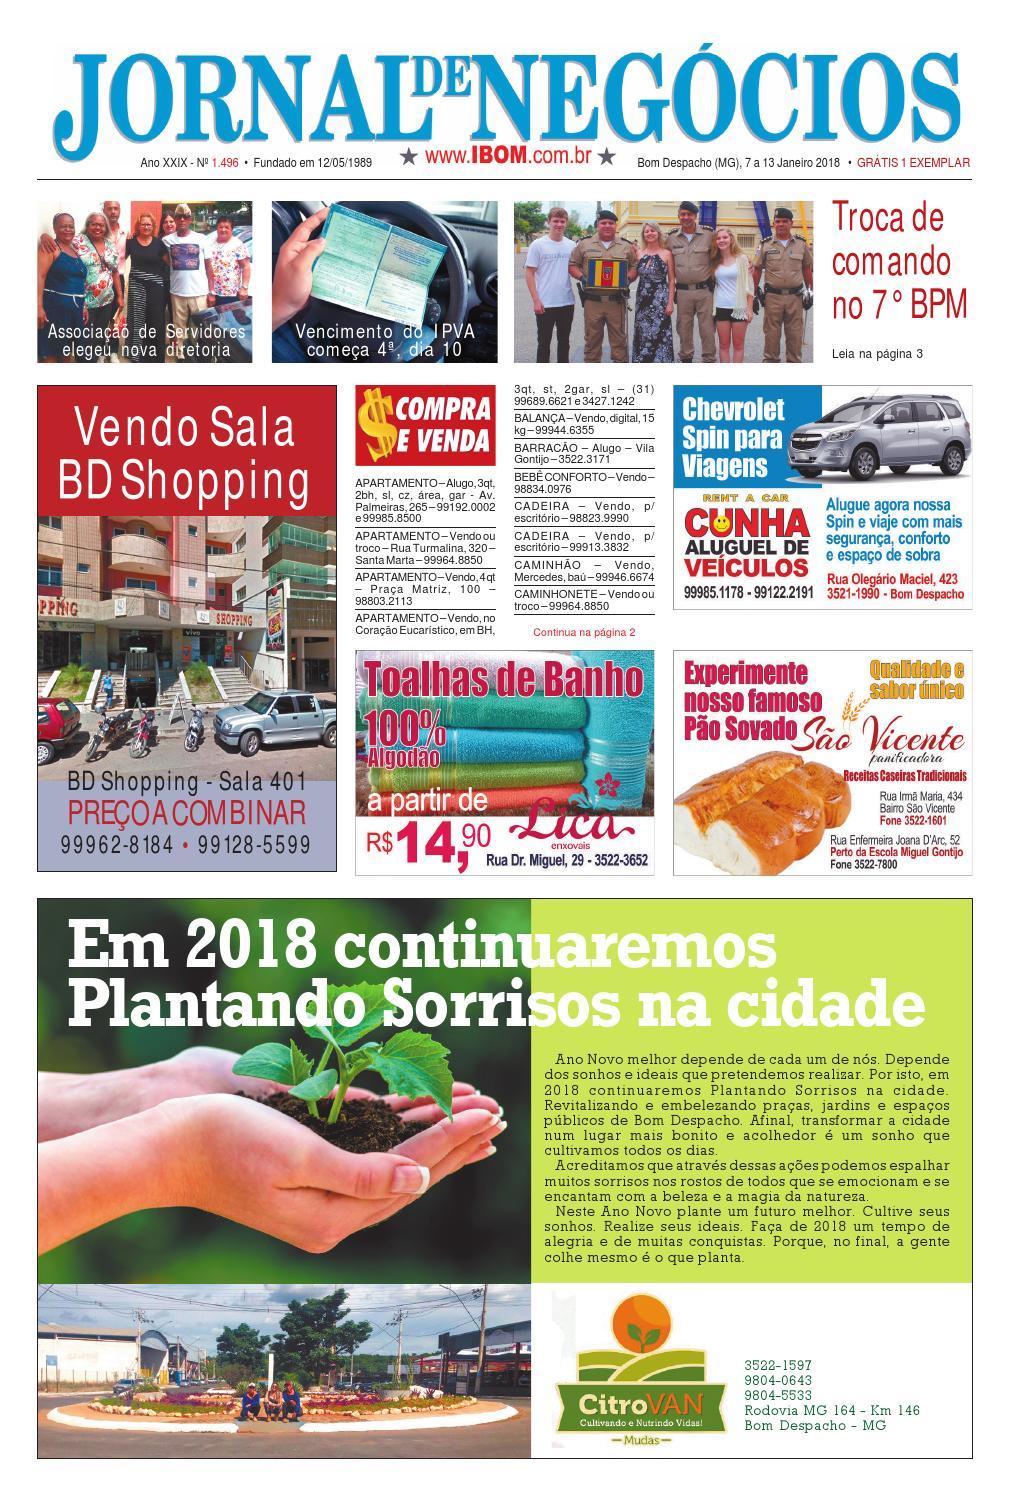 Jornal negocios 1496 pags 1 a 12 by Jornal de Negocios - issuu 5a794b0cb8